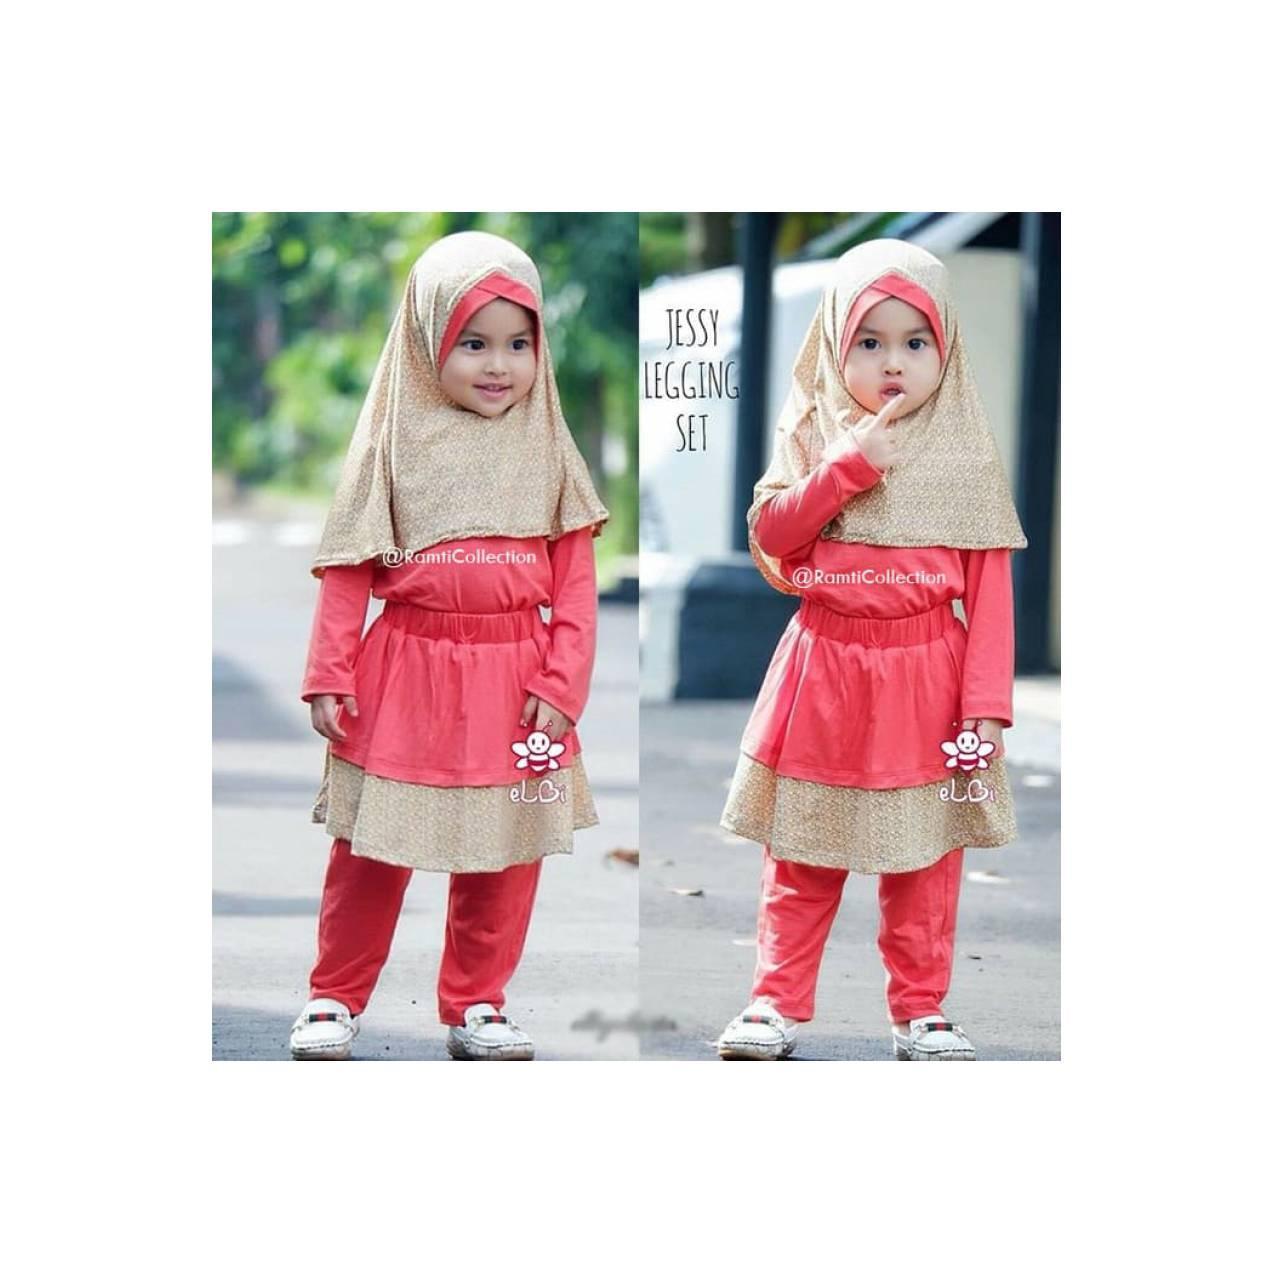 gamis anak kecil I jual grosir baju anak I baju muslim bayi I Jessy